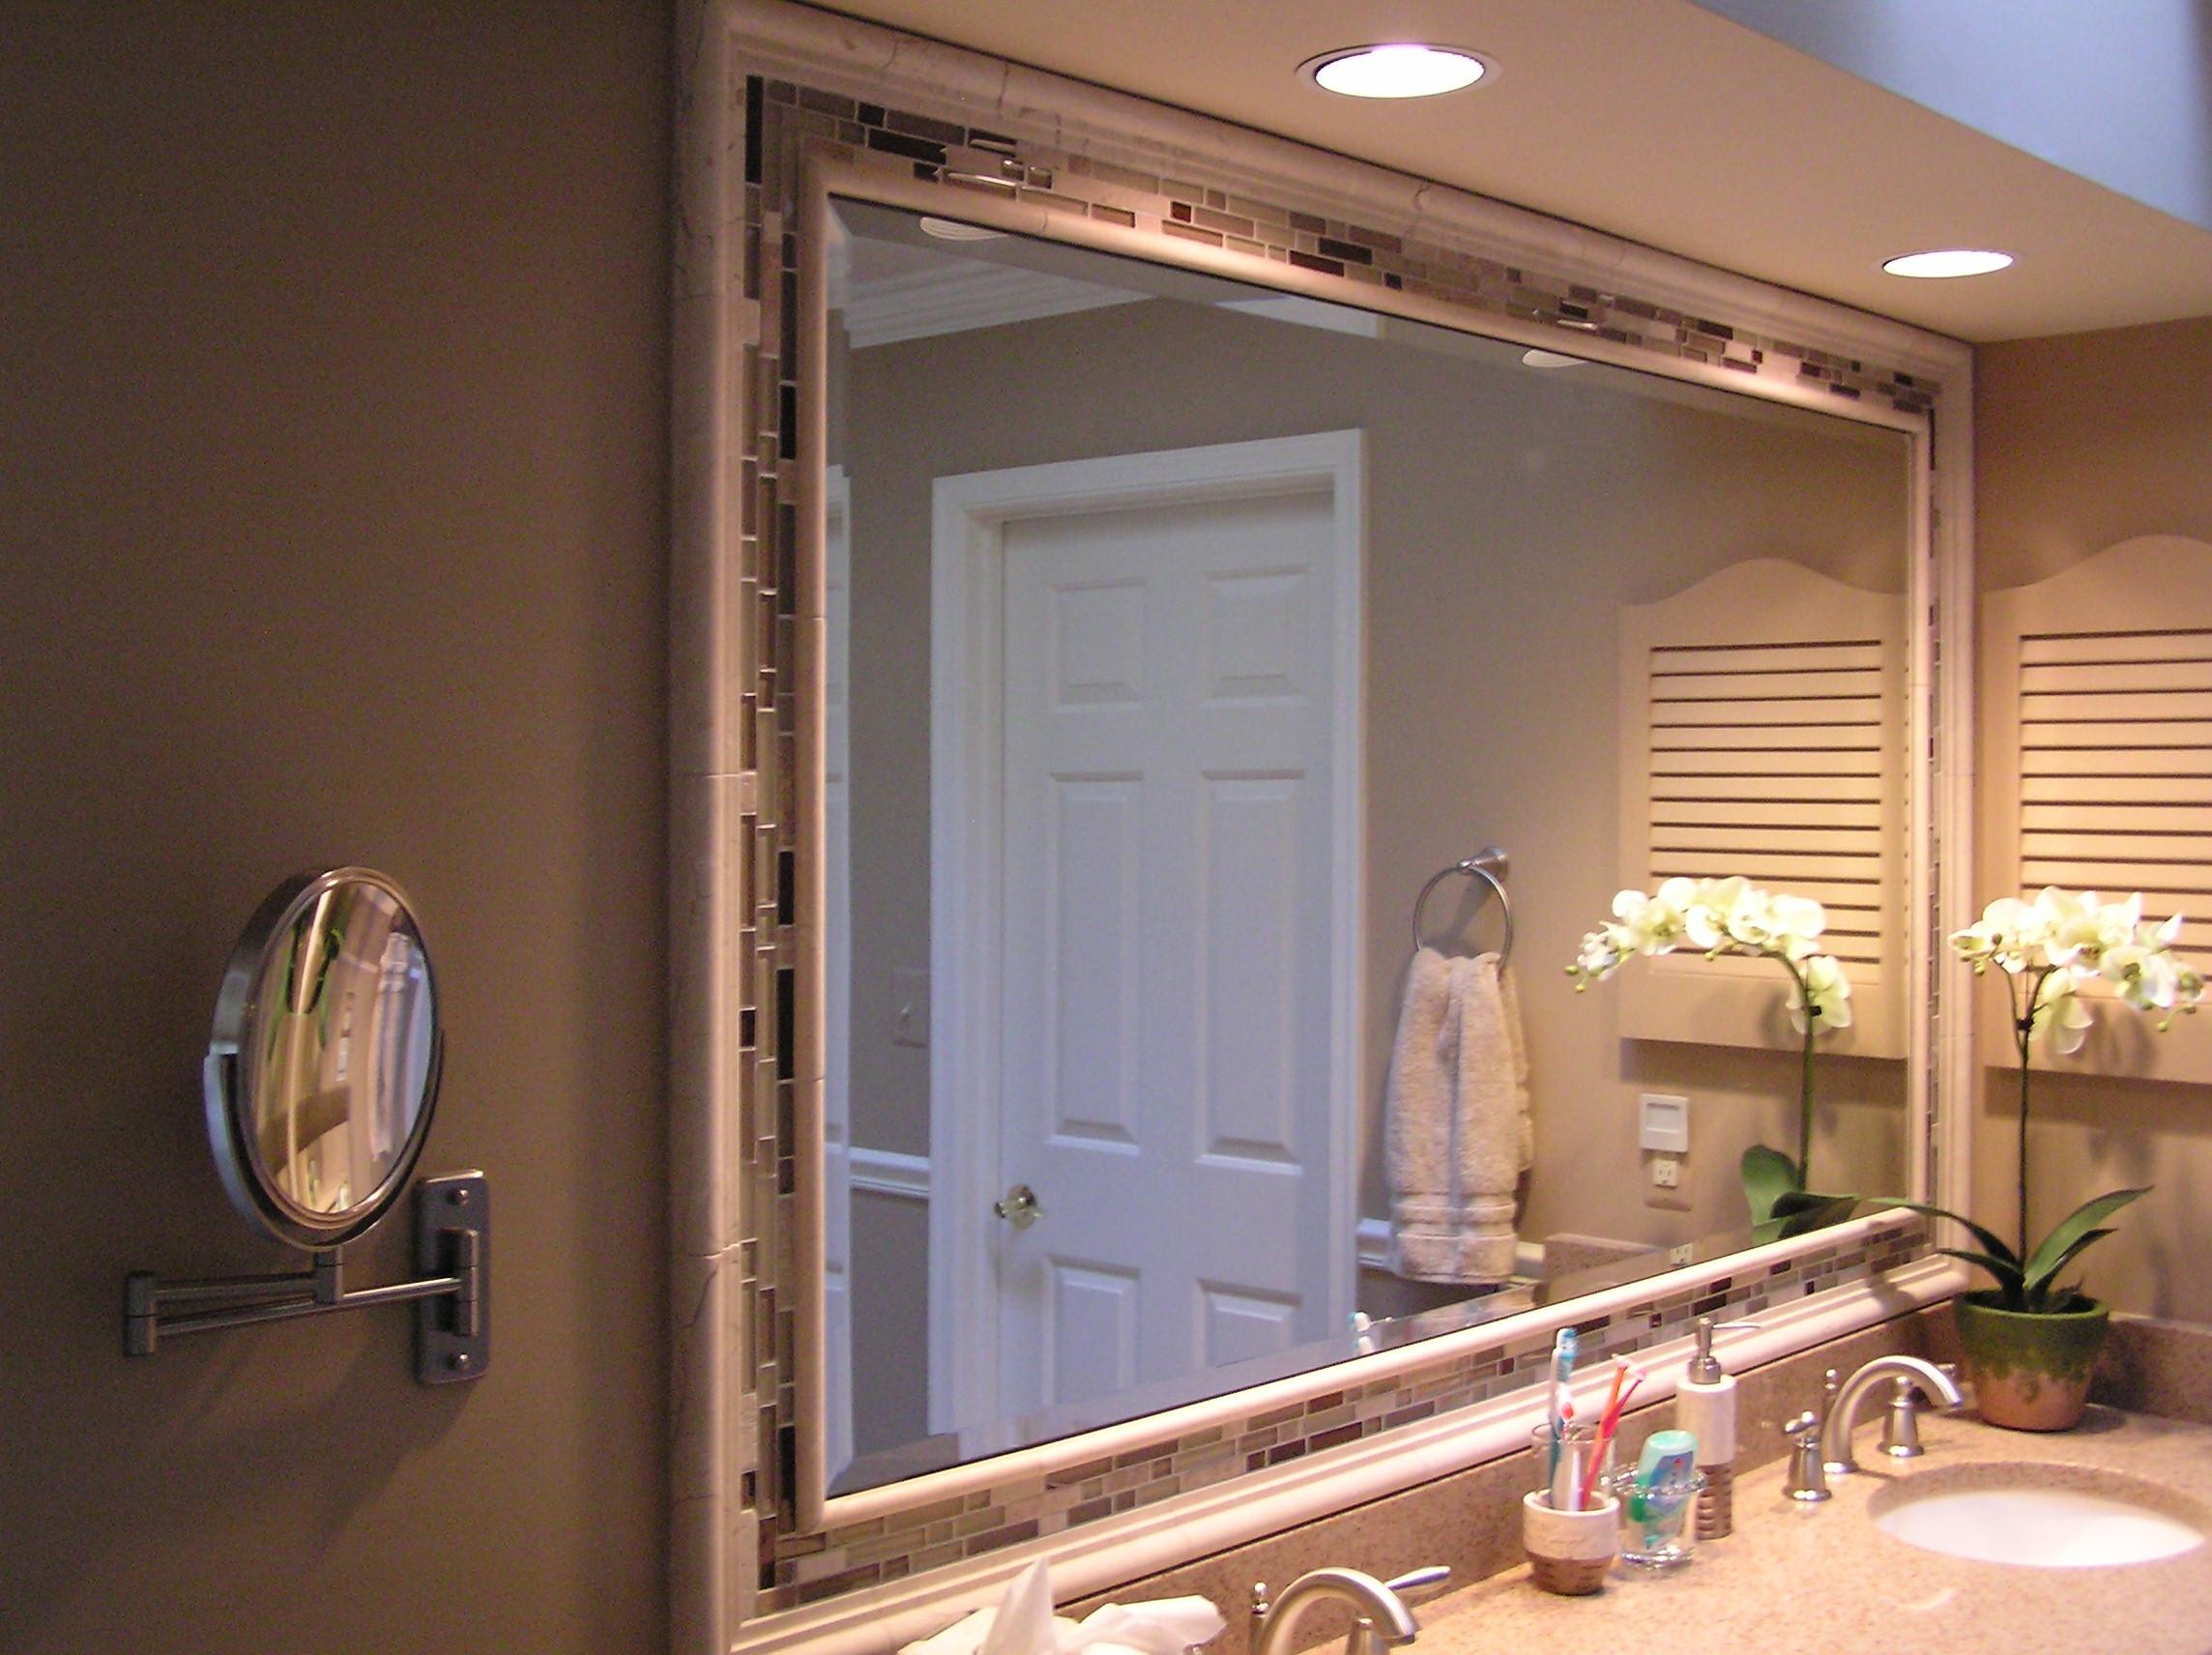 Large Landscape Bathroom Mirror2288 X 1712